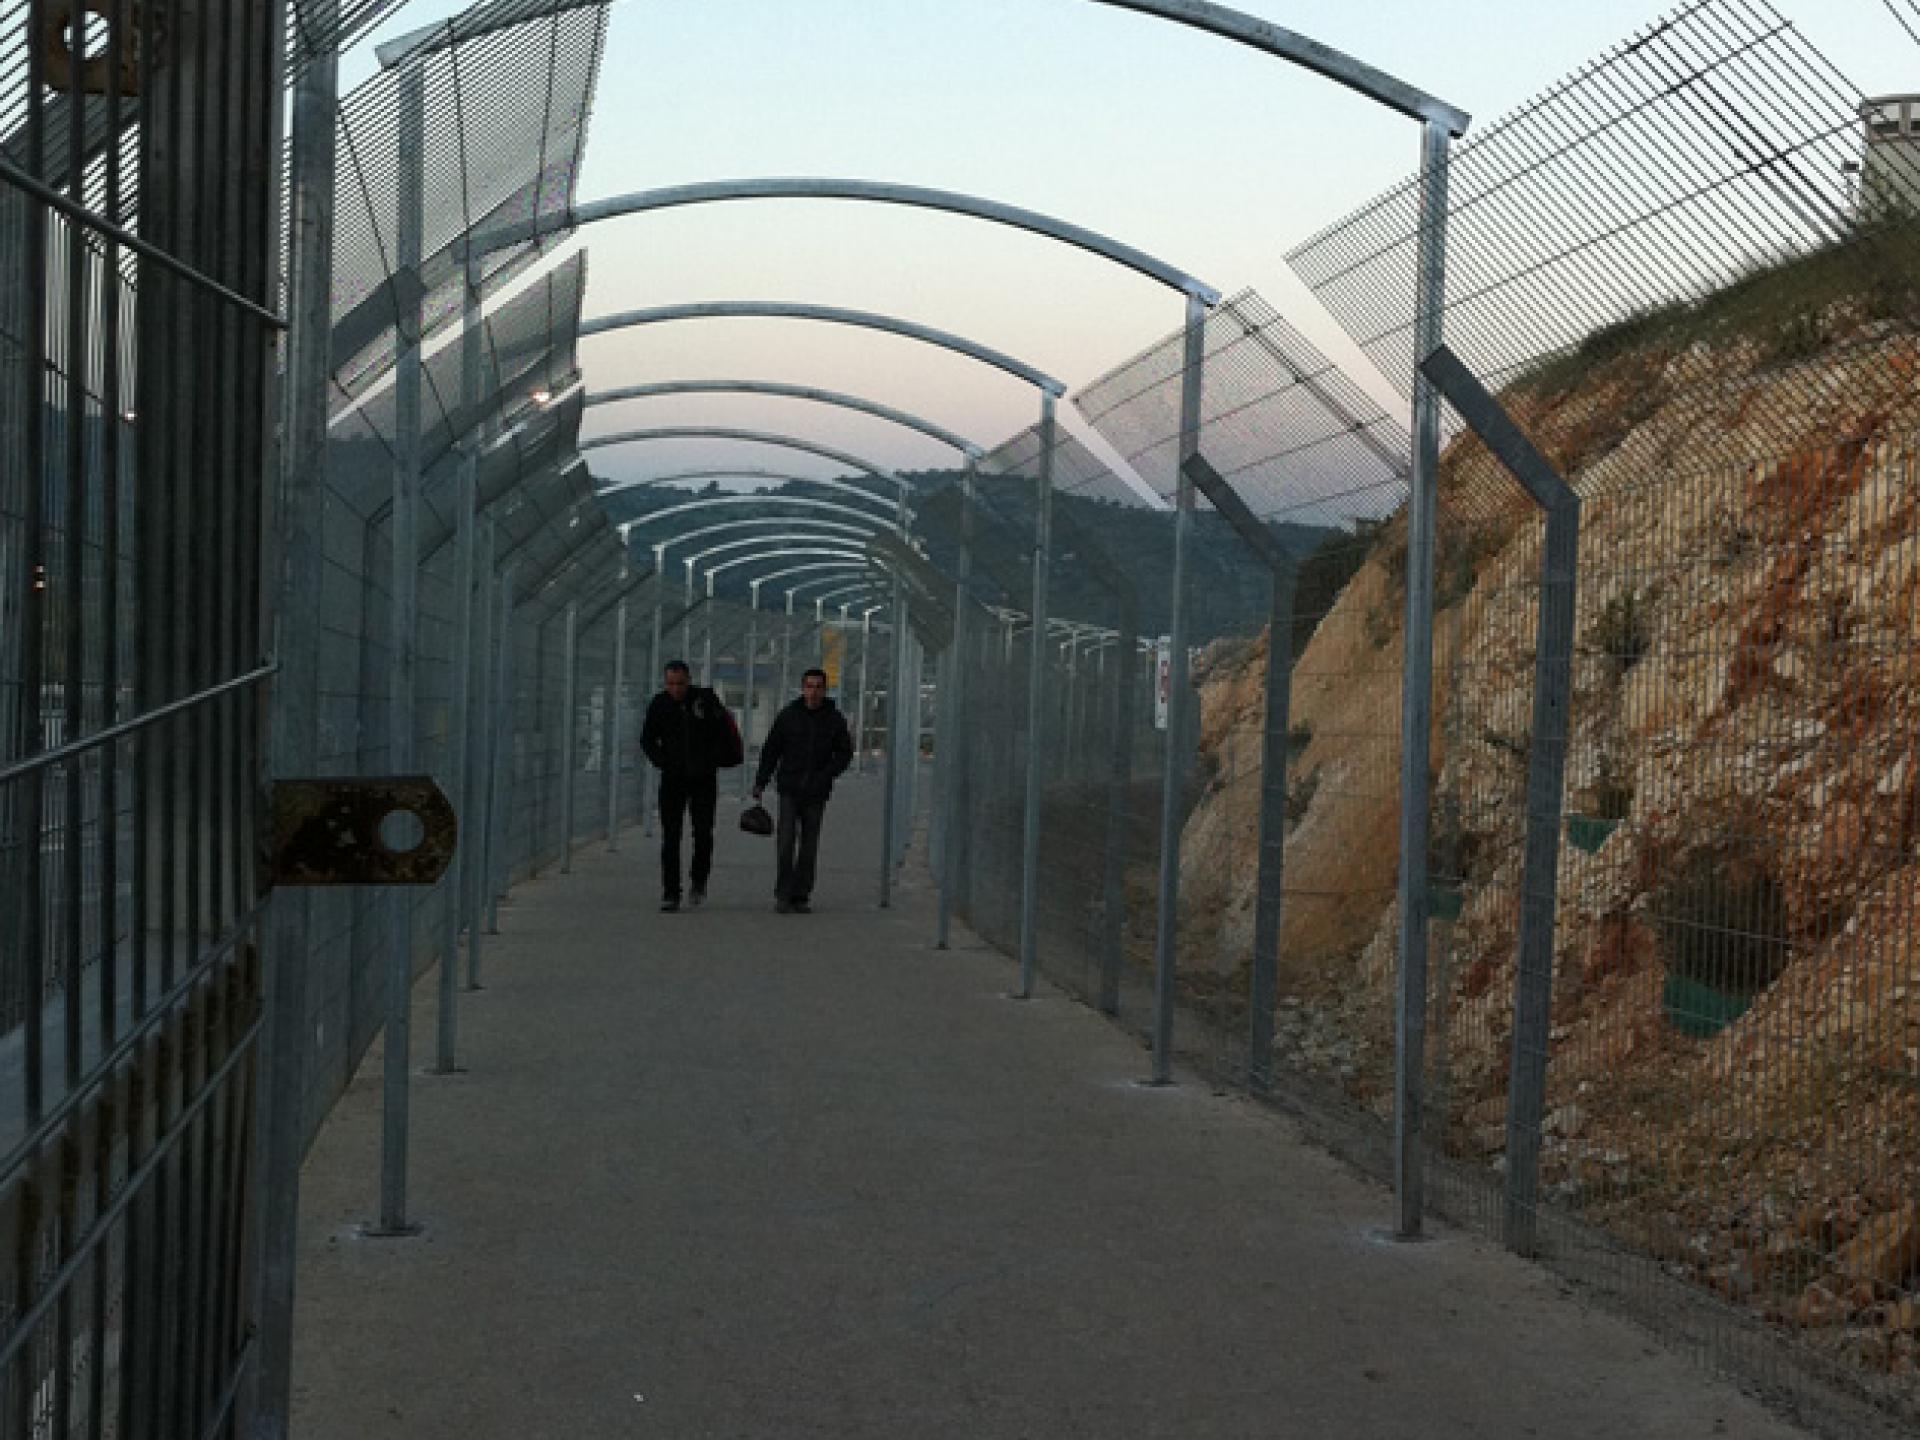 Barta'a/Reikhan checkpoint 01.04.12